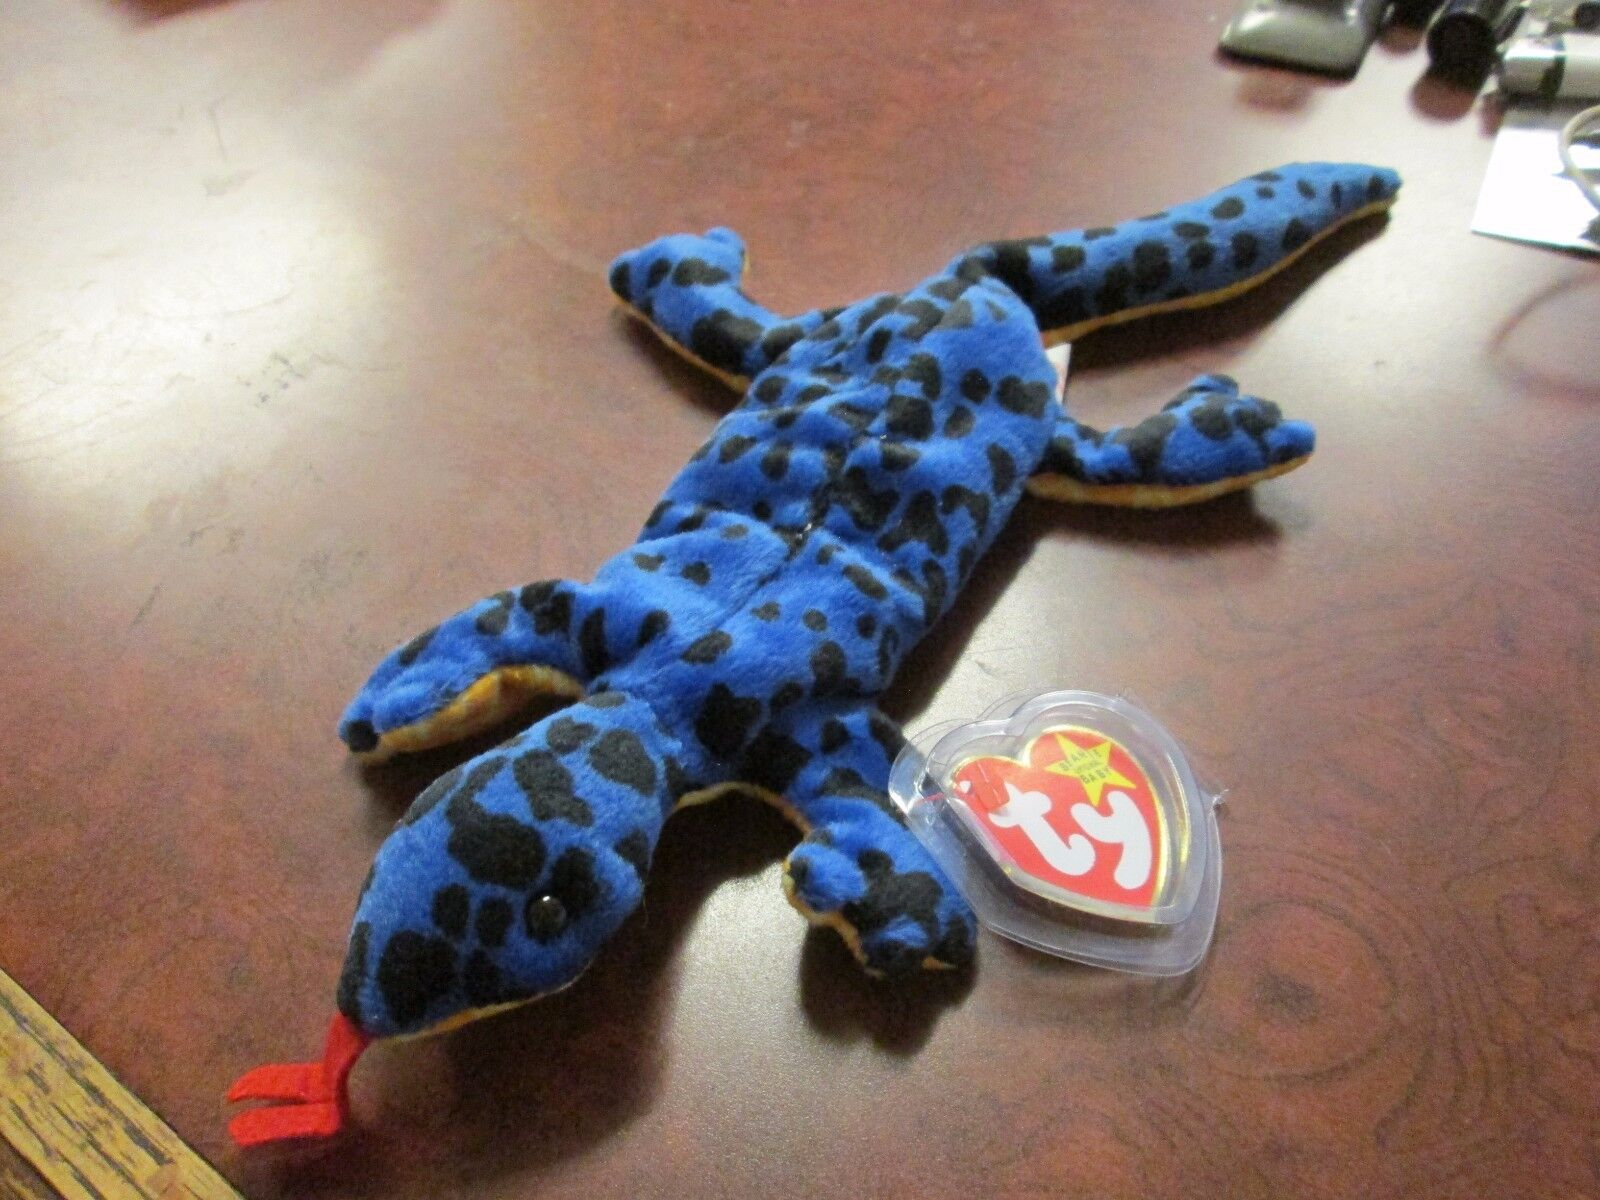 MWMT Lizzy Lizard TY original beanie baby RETIRED PVC pellets 1995